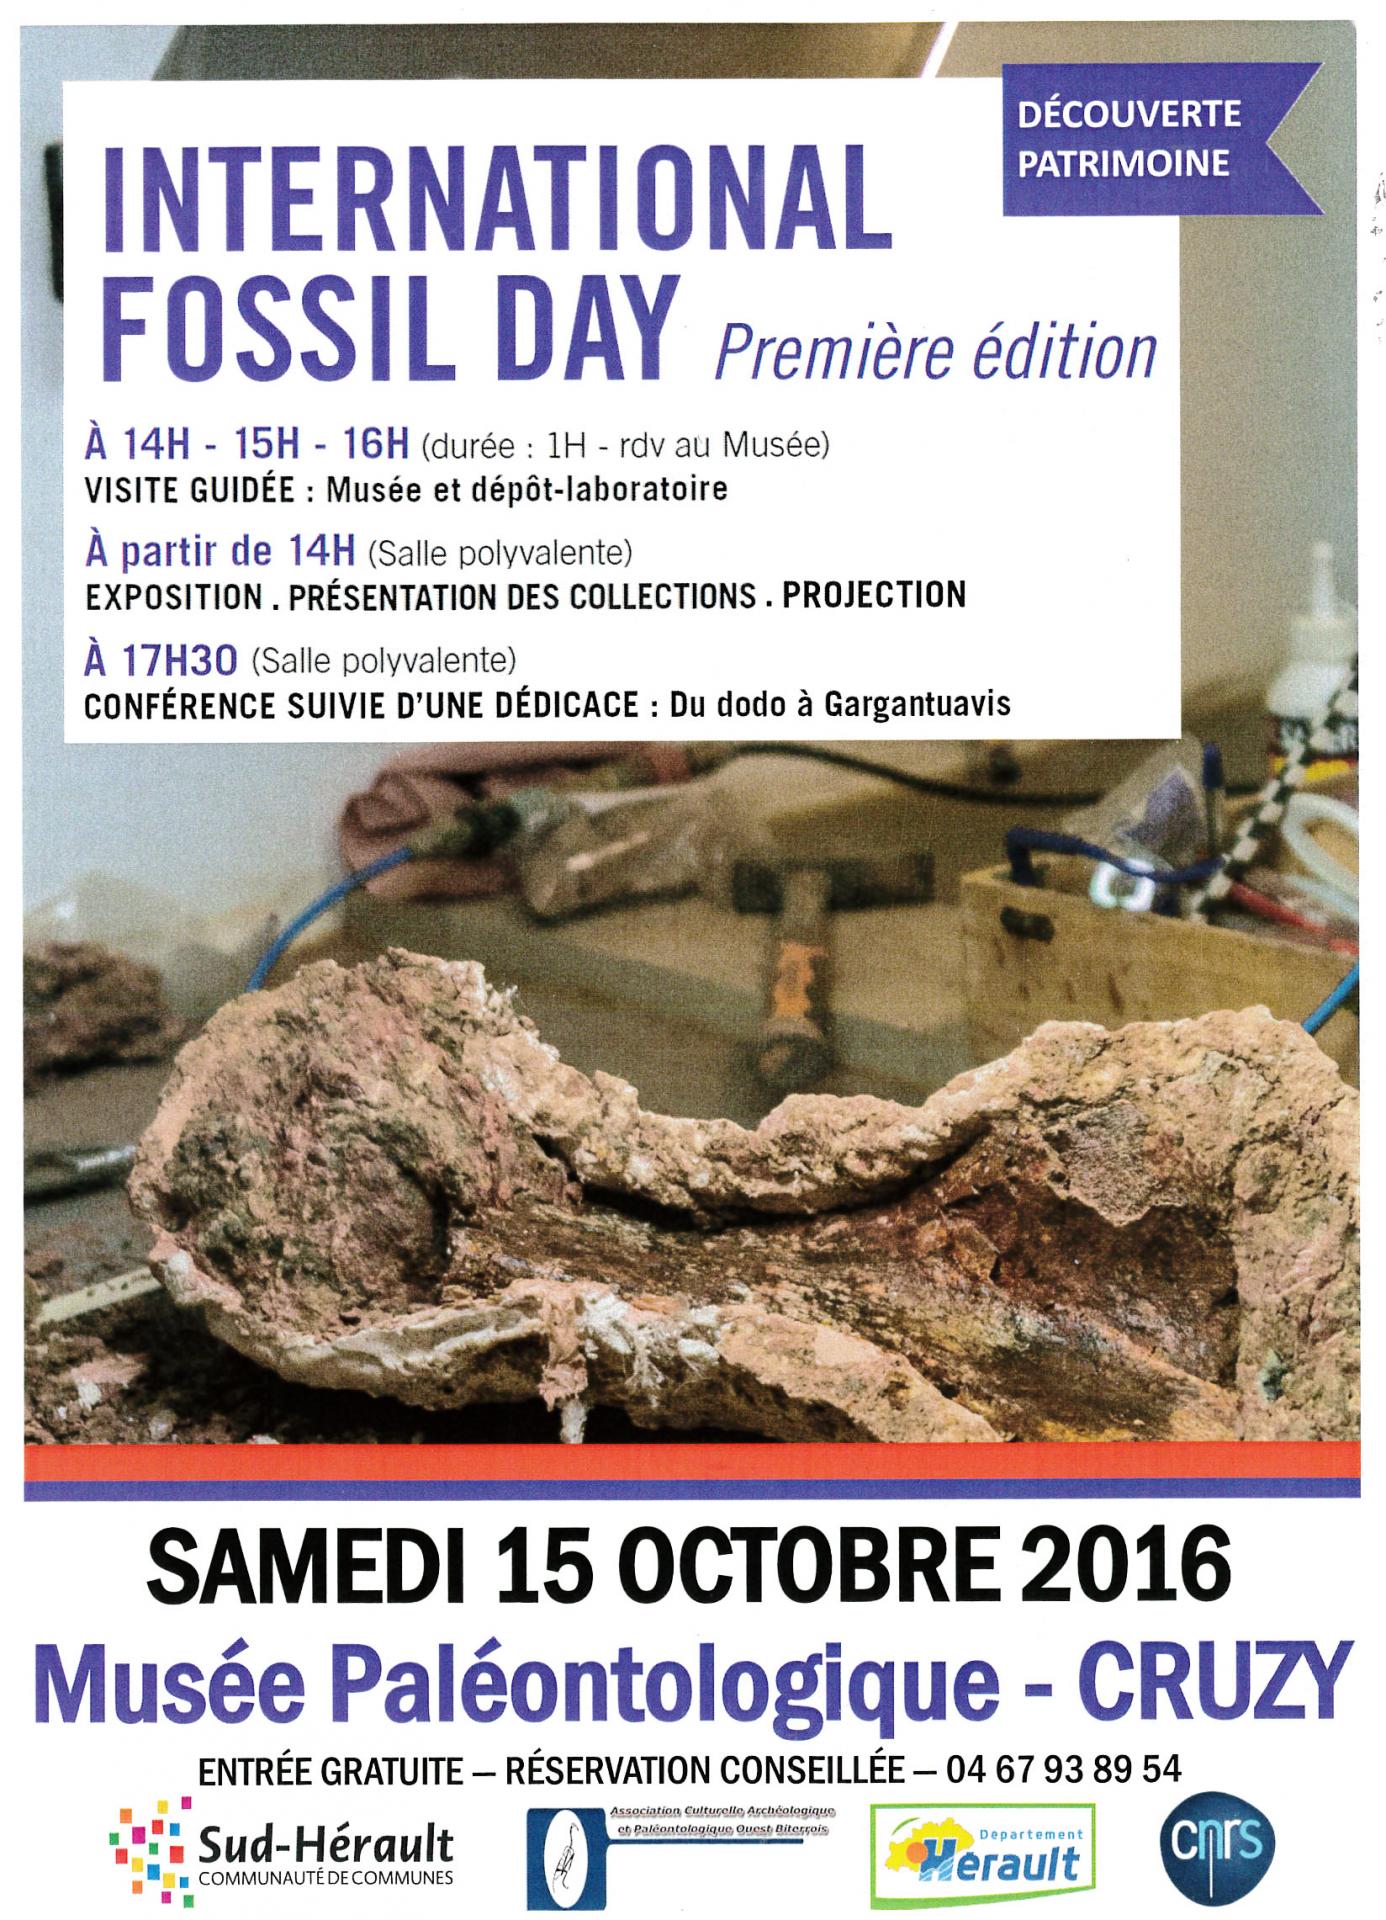 2016 10 15 musee paleontologique cruzy